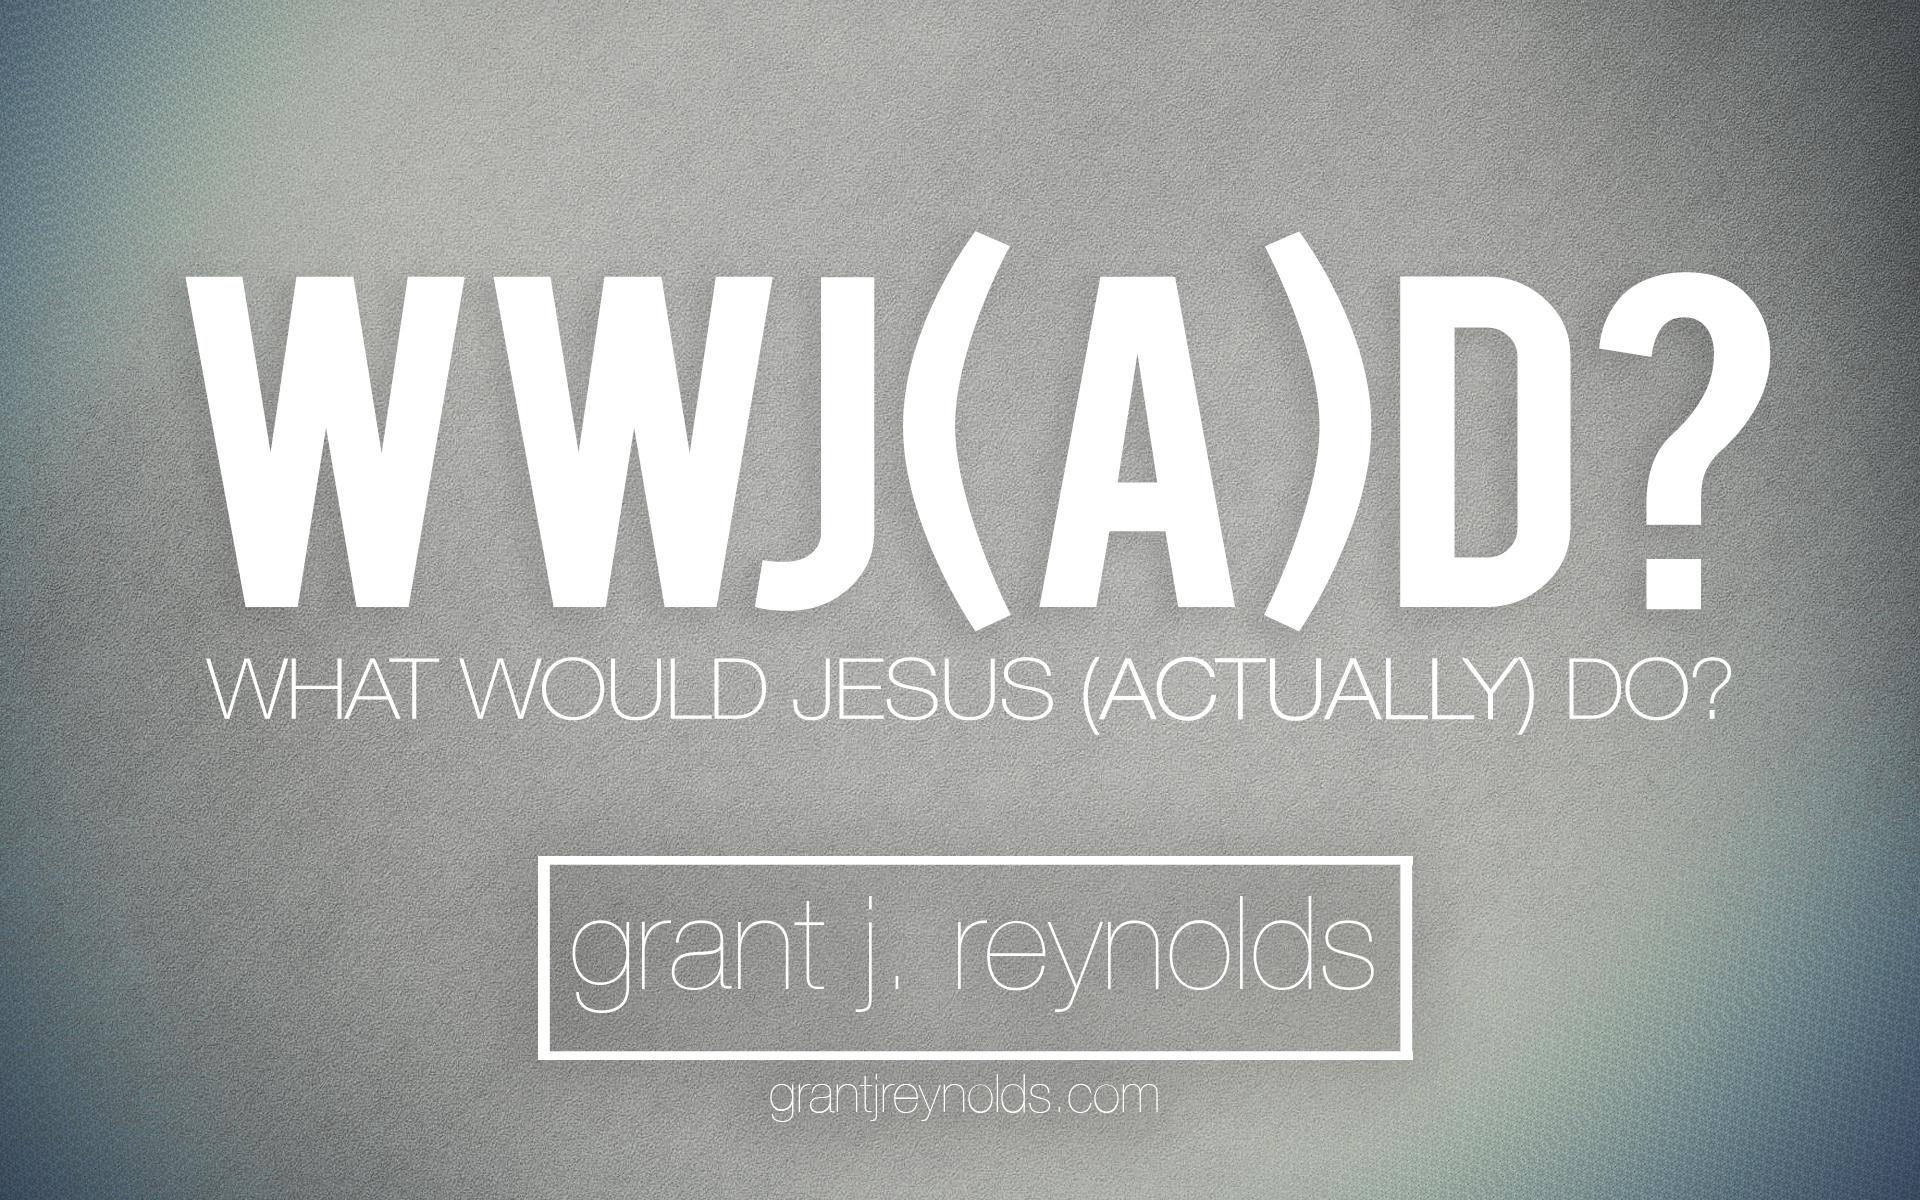 wwjad-photo.jpg